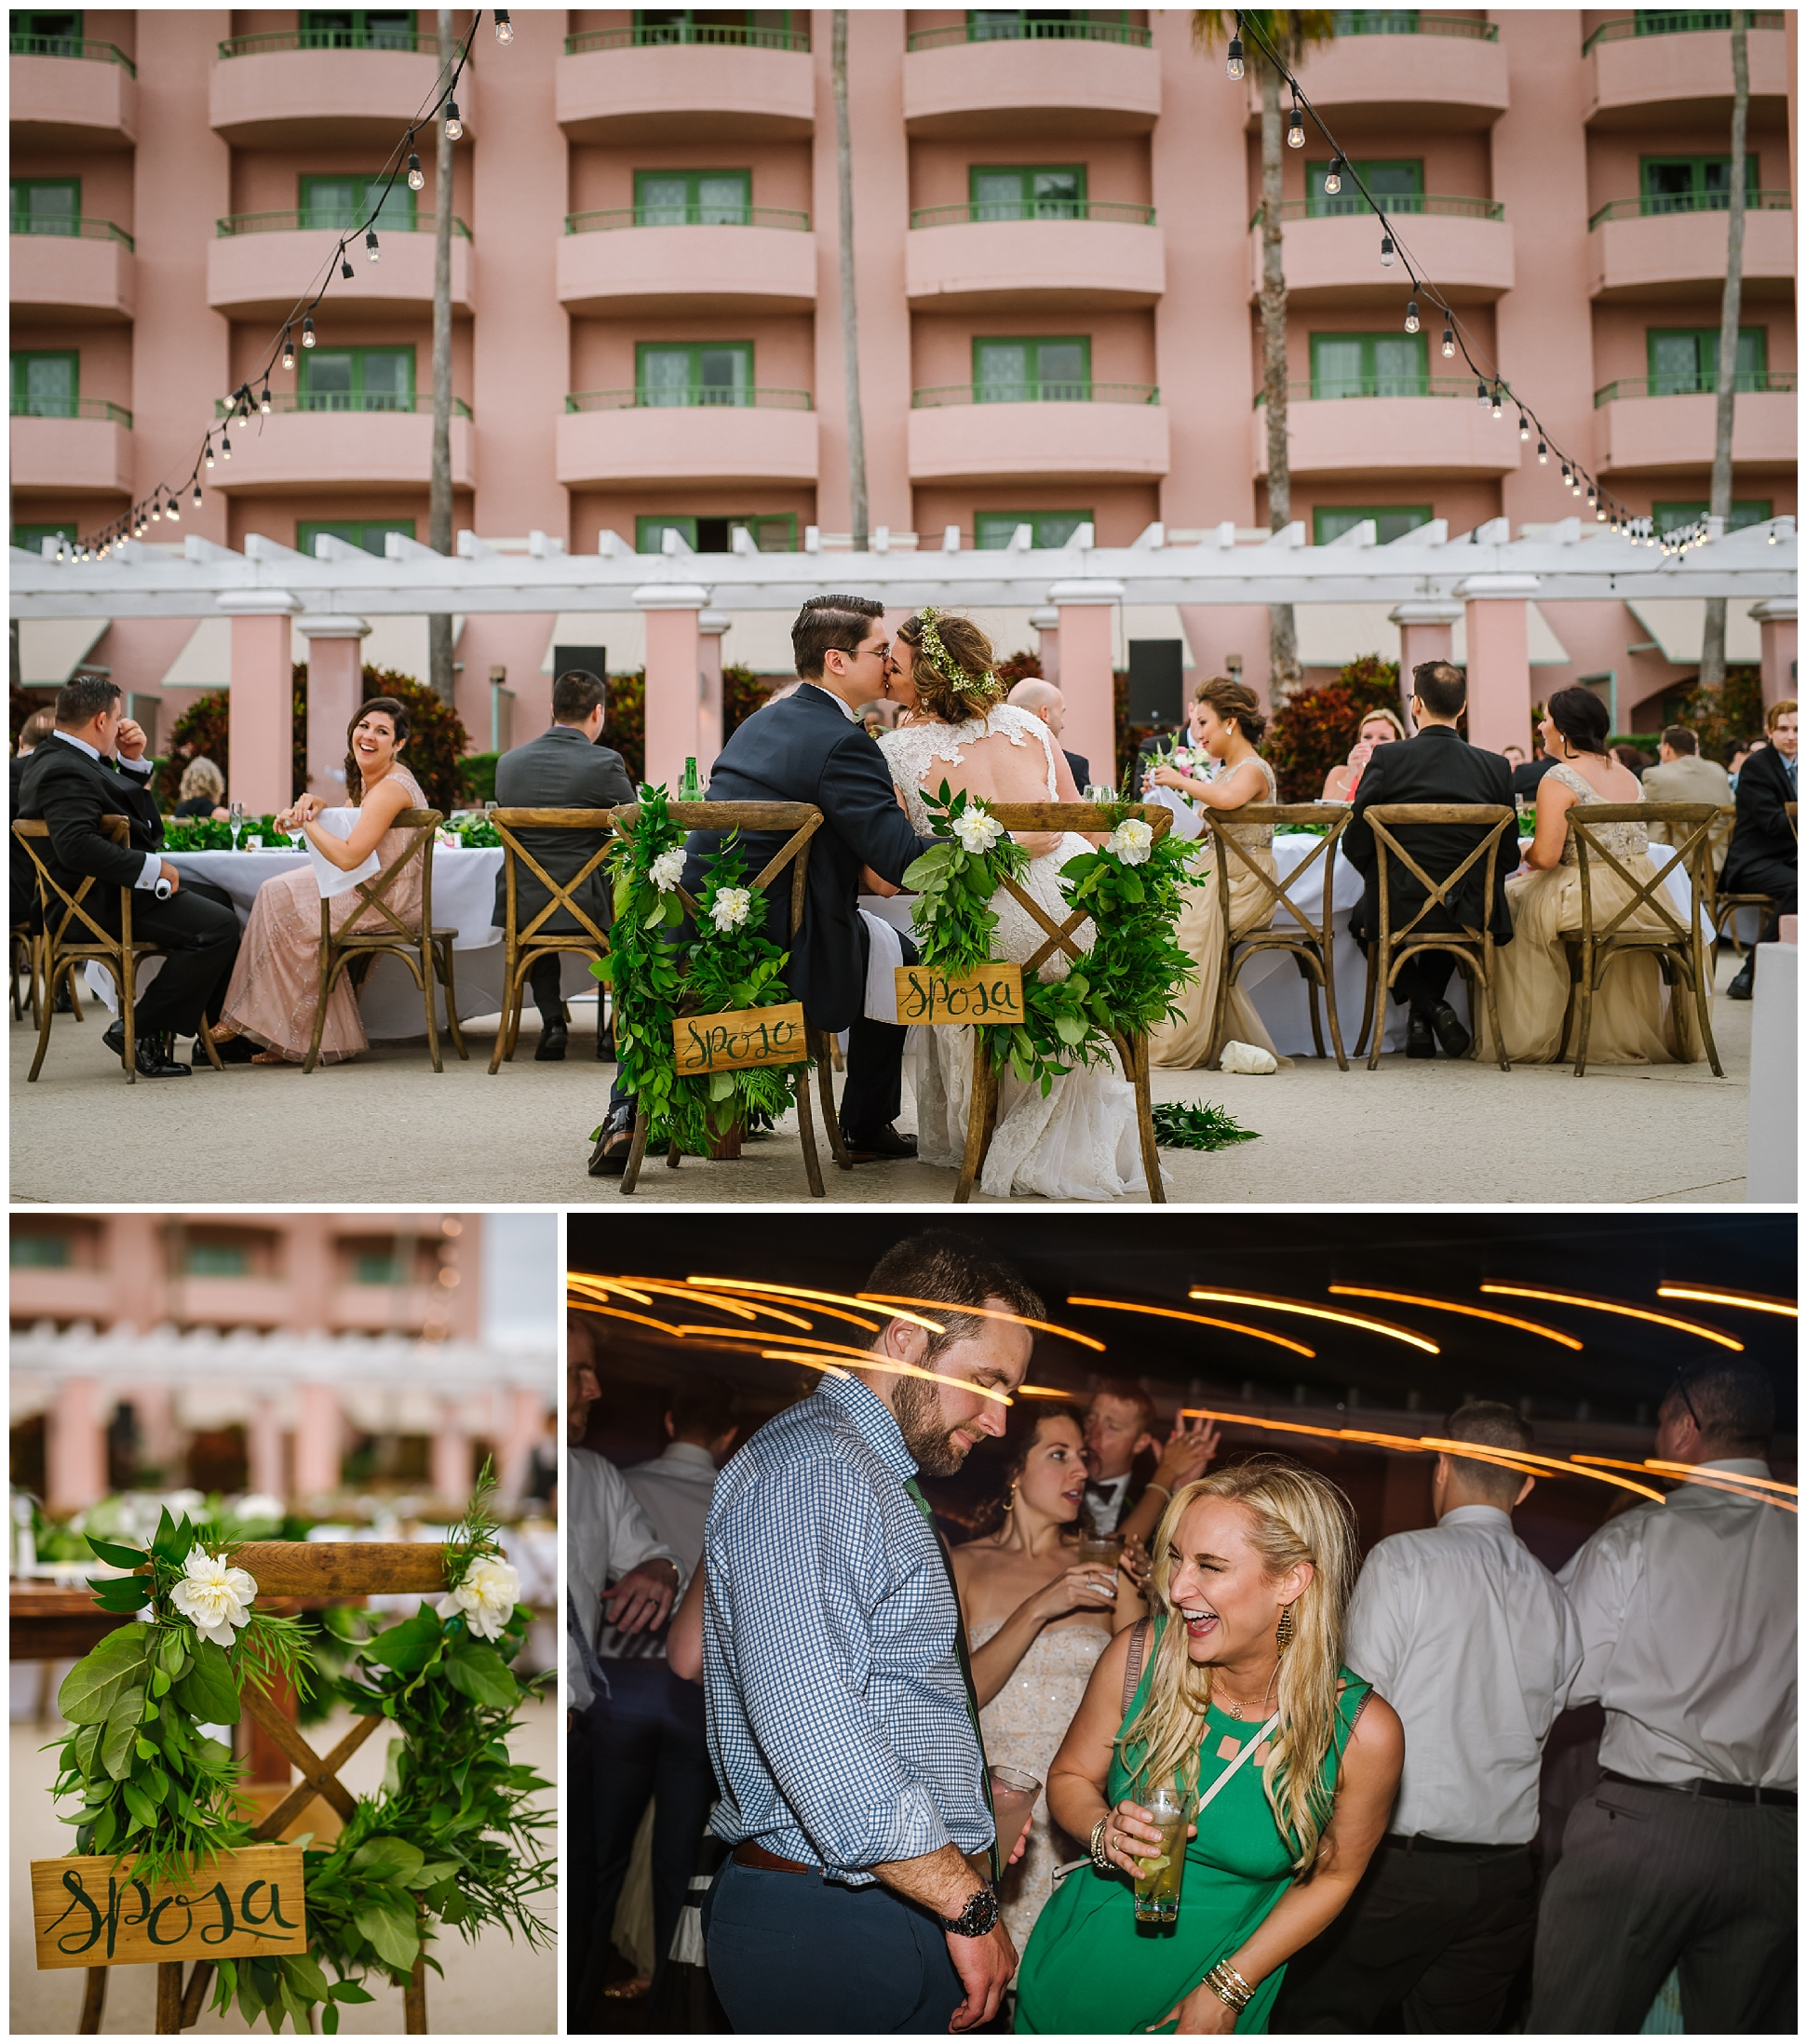 Ashlee-hamon-photography-year-in-review-2016-travel-wanderlust-vsco-adventure-wedding_0019.jpg